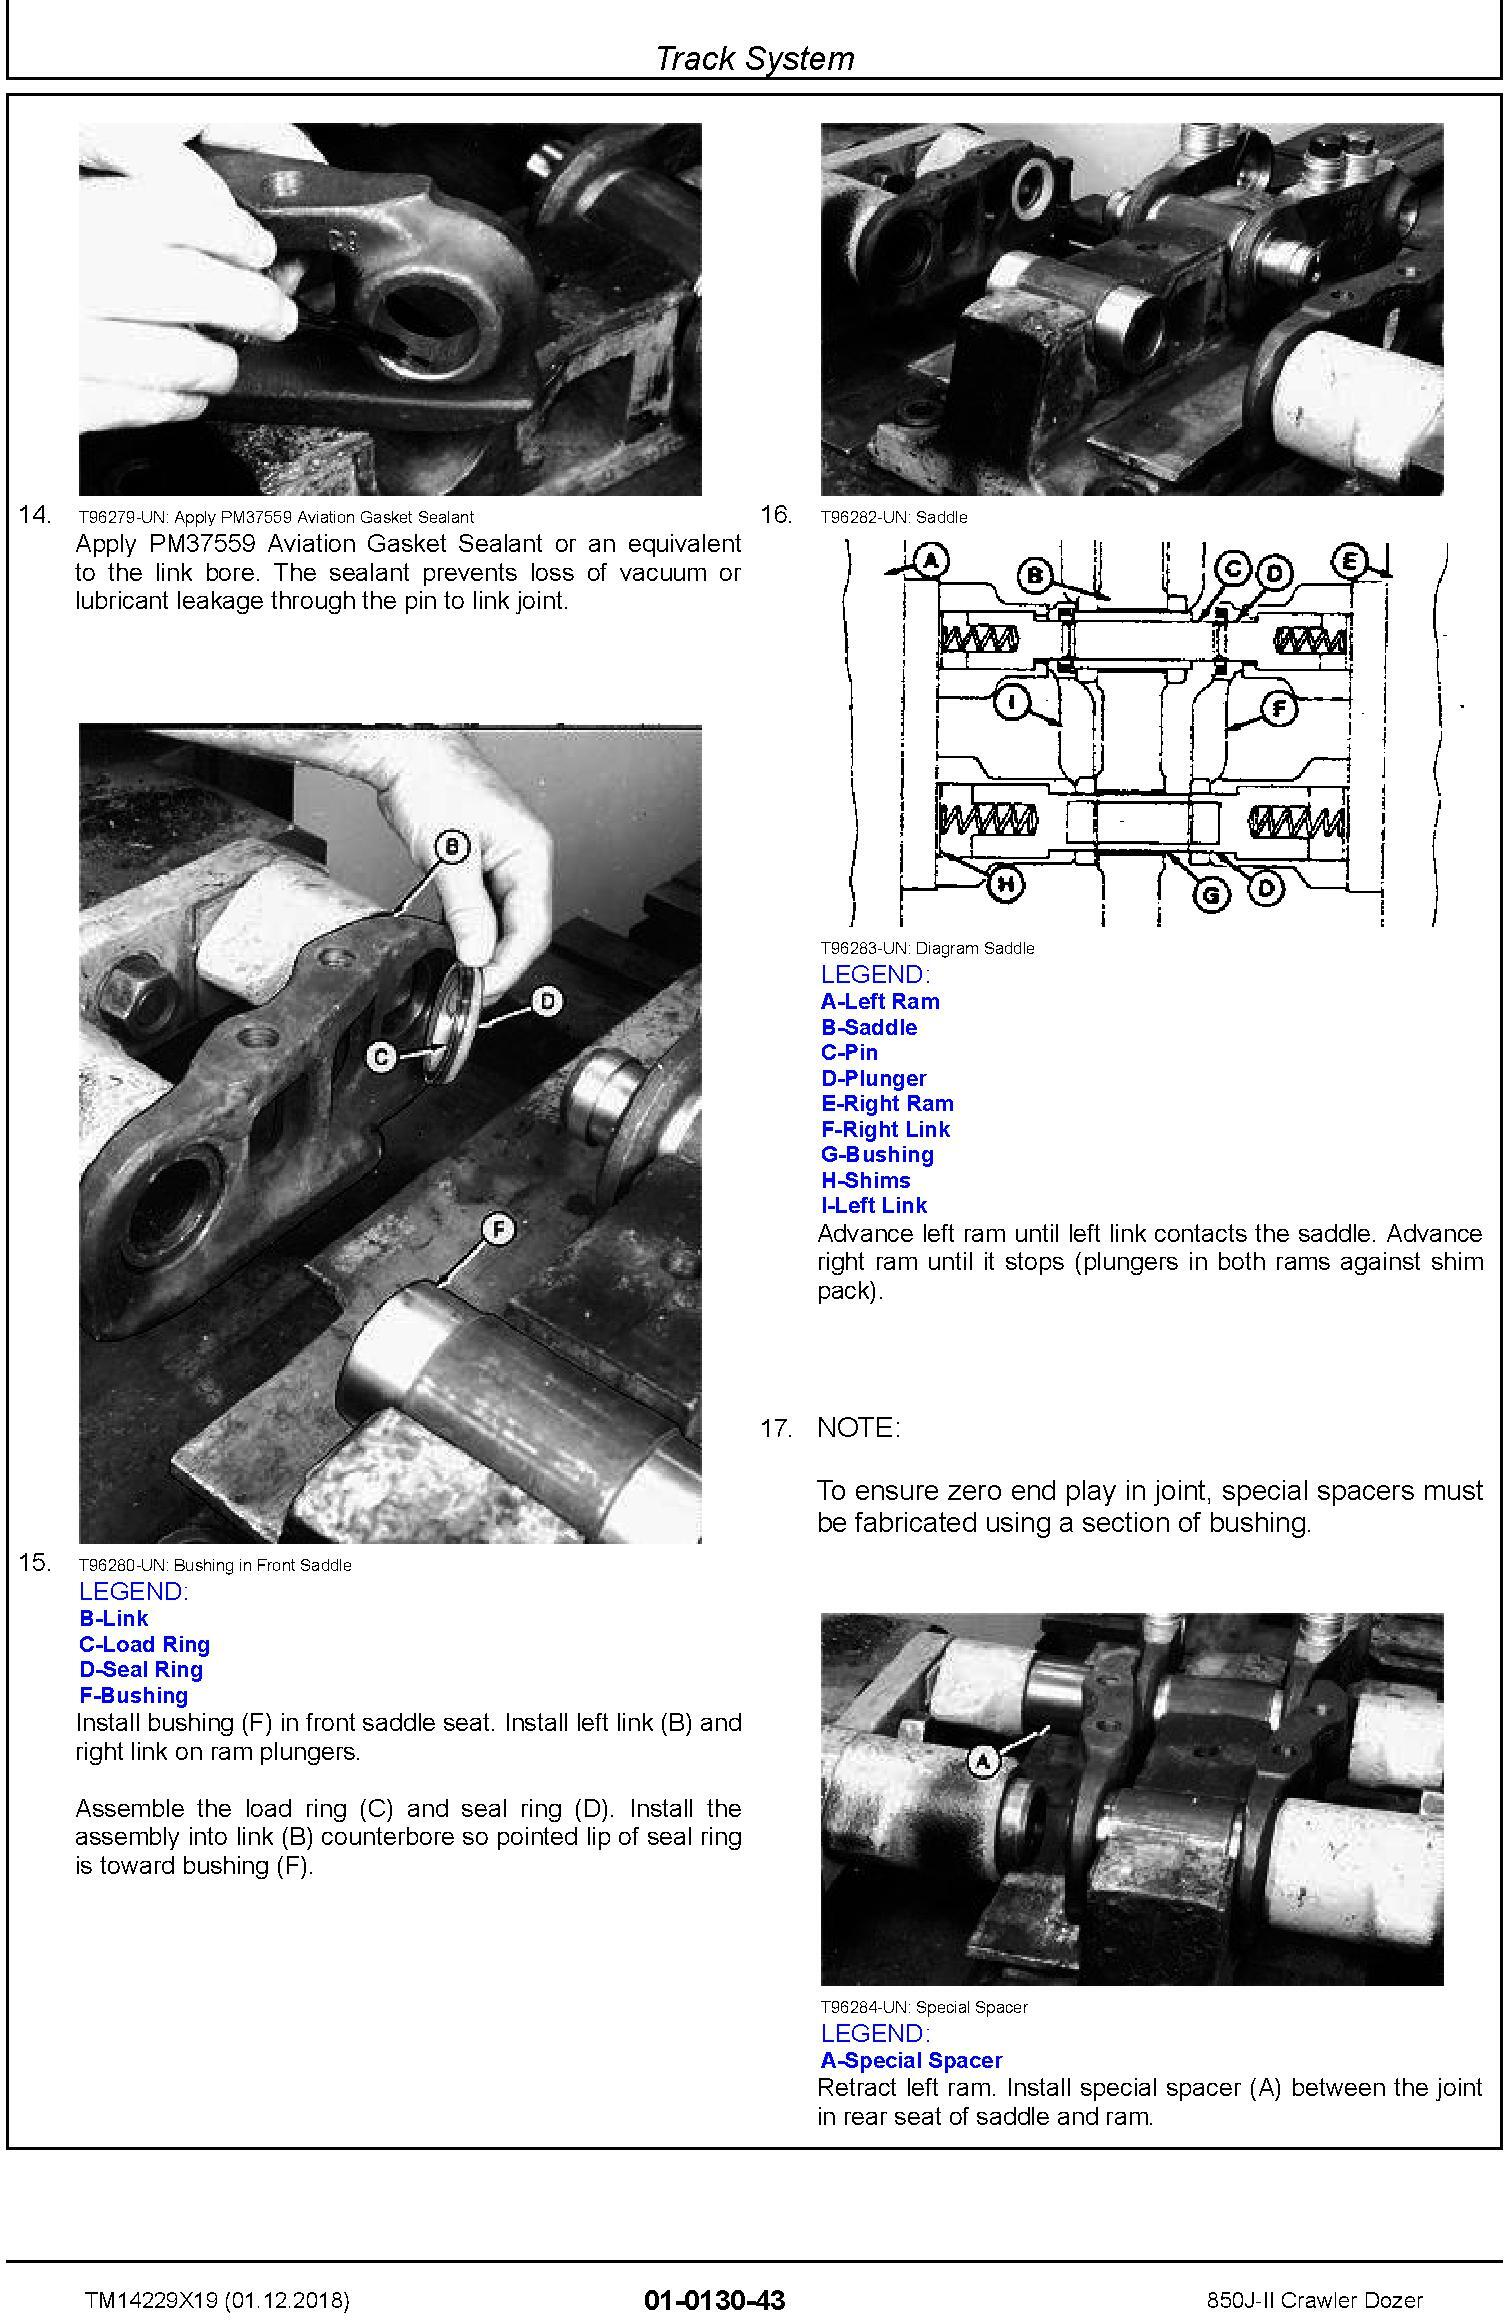 John Deere 850J-II (SN. C306799-354851) Crawler Dozer Repair Technical Service Manual (TM14229X19) - 1